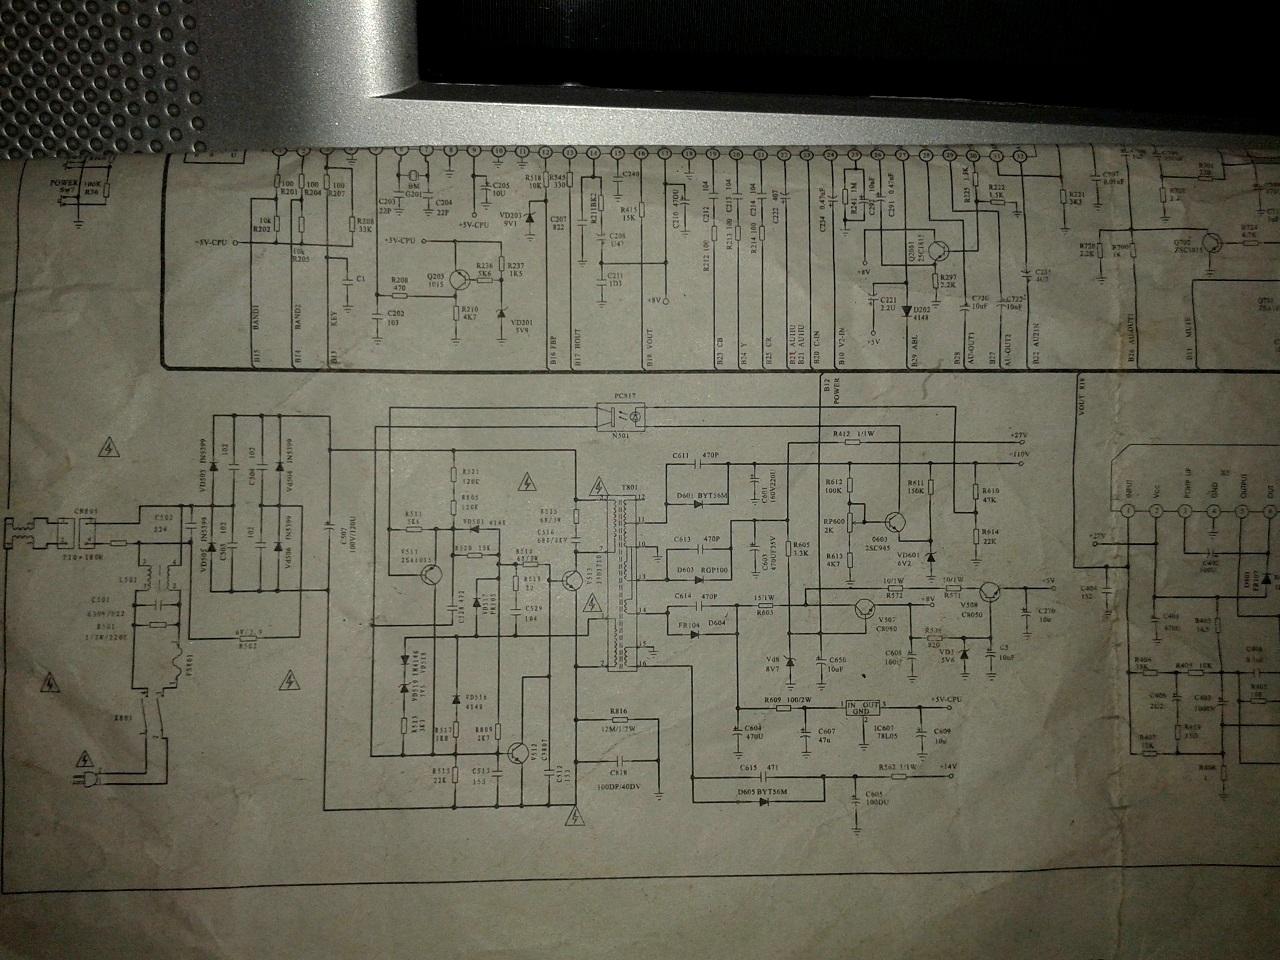 medium resolution of refer the circuit diagram